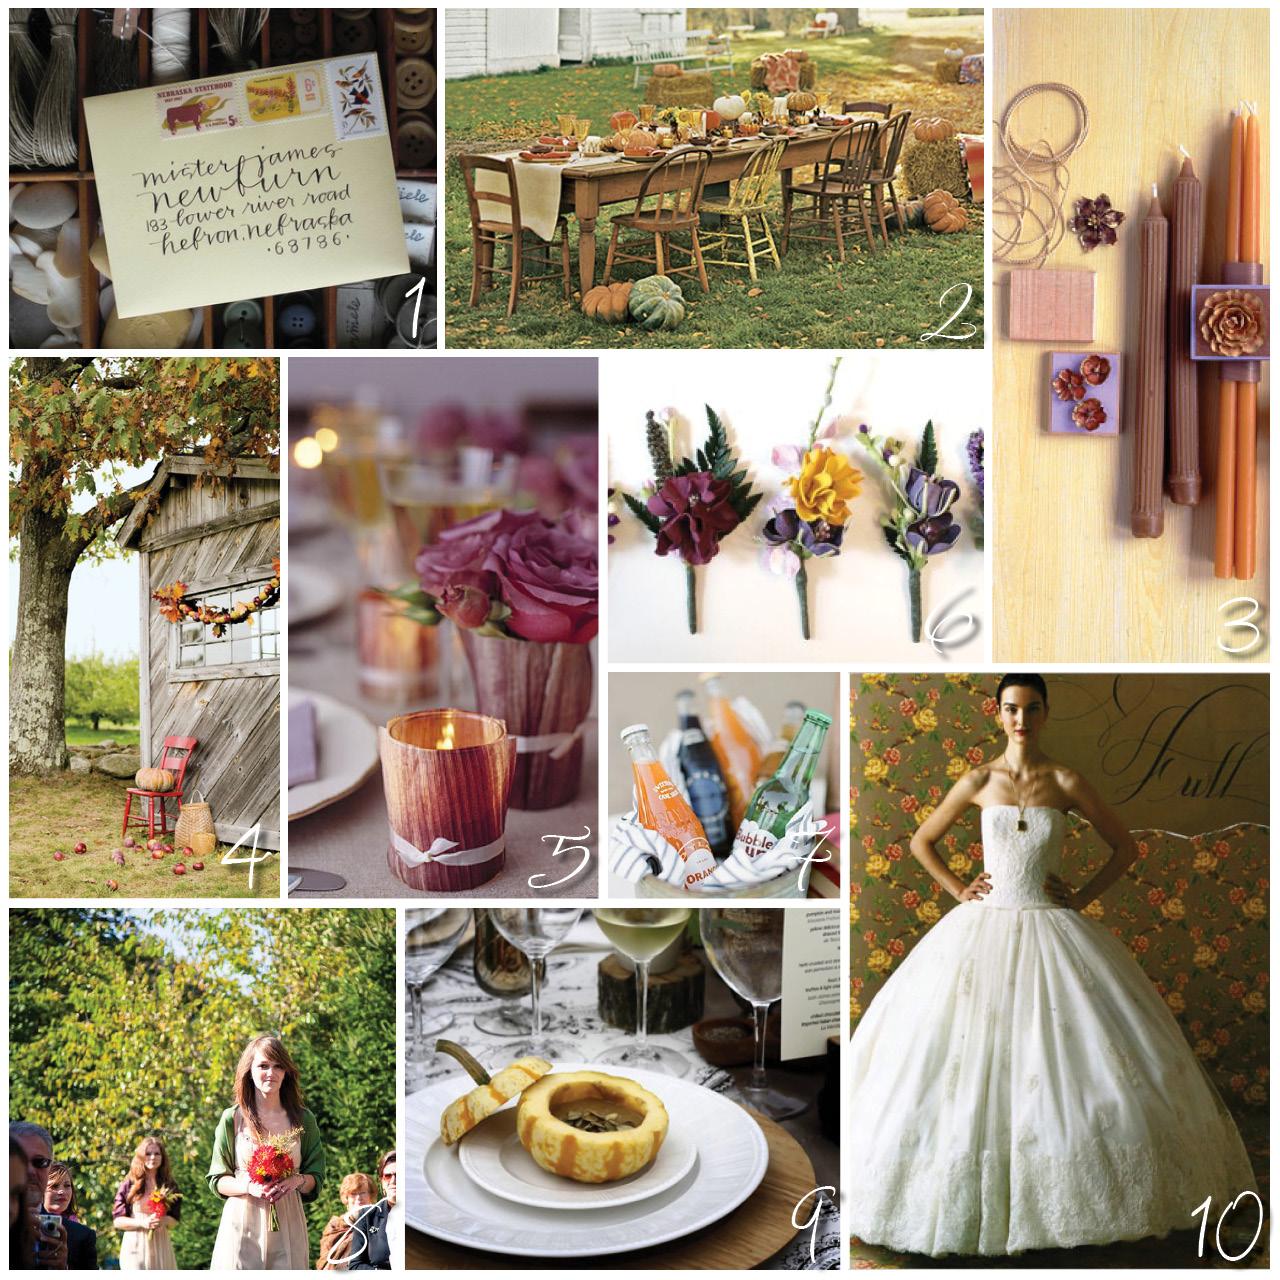 saving money on your wedding tips ideas bridaltweet wedding forum vendor directory. Black Bedroom Furniture Sets. Home Design Ideas